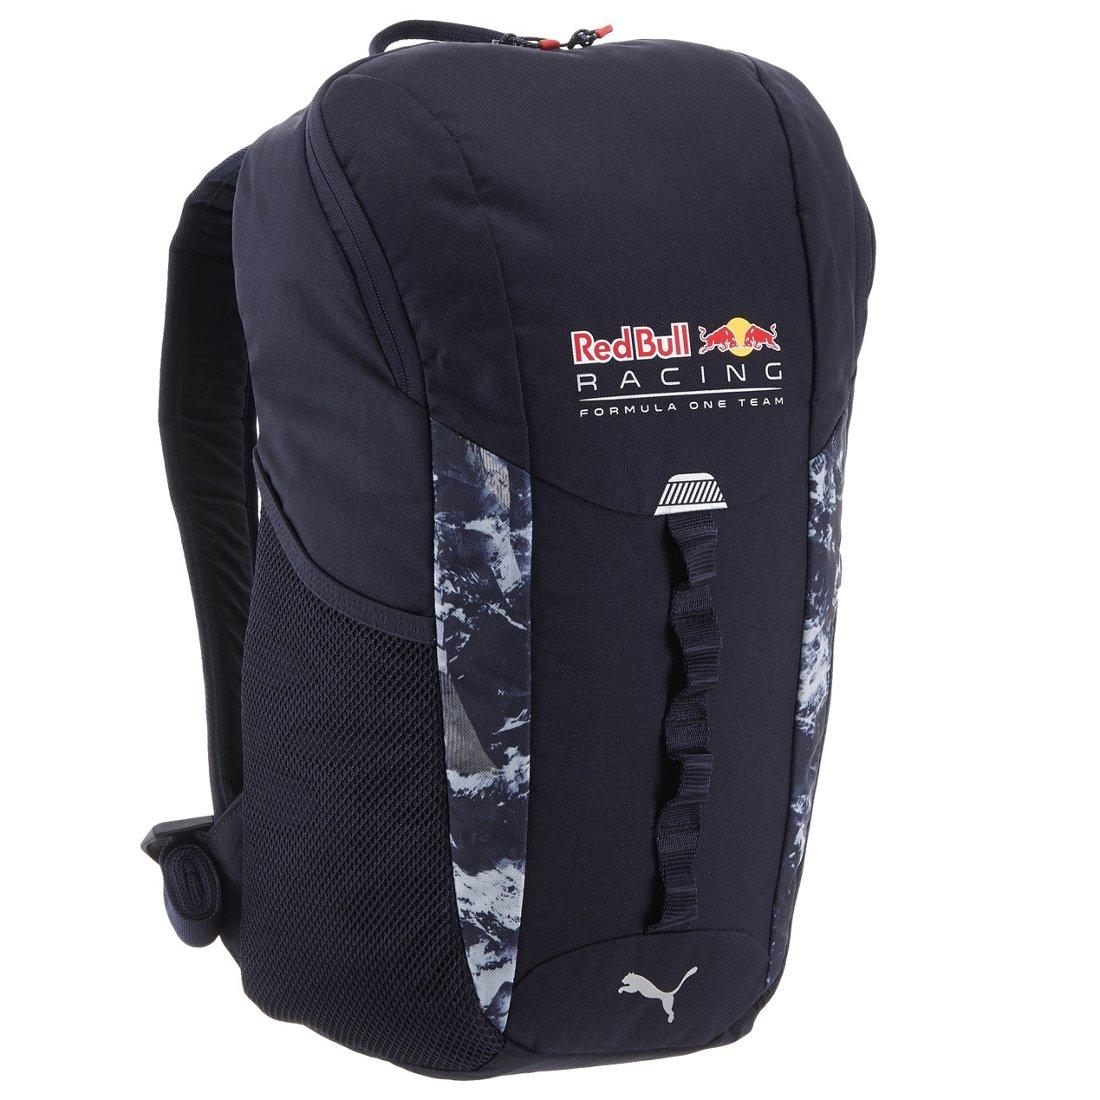 d54e57b205176 Puma Red Bull Racing Replica Rucksack 48 cm - koffer-direkt.de